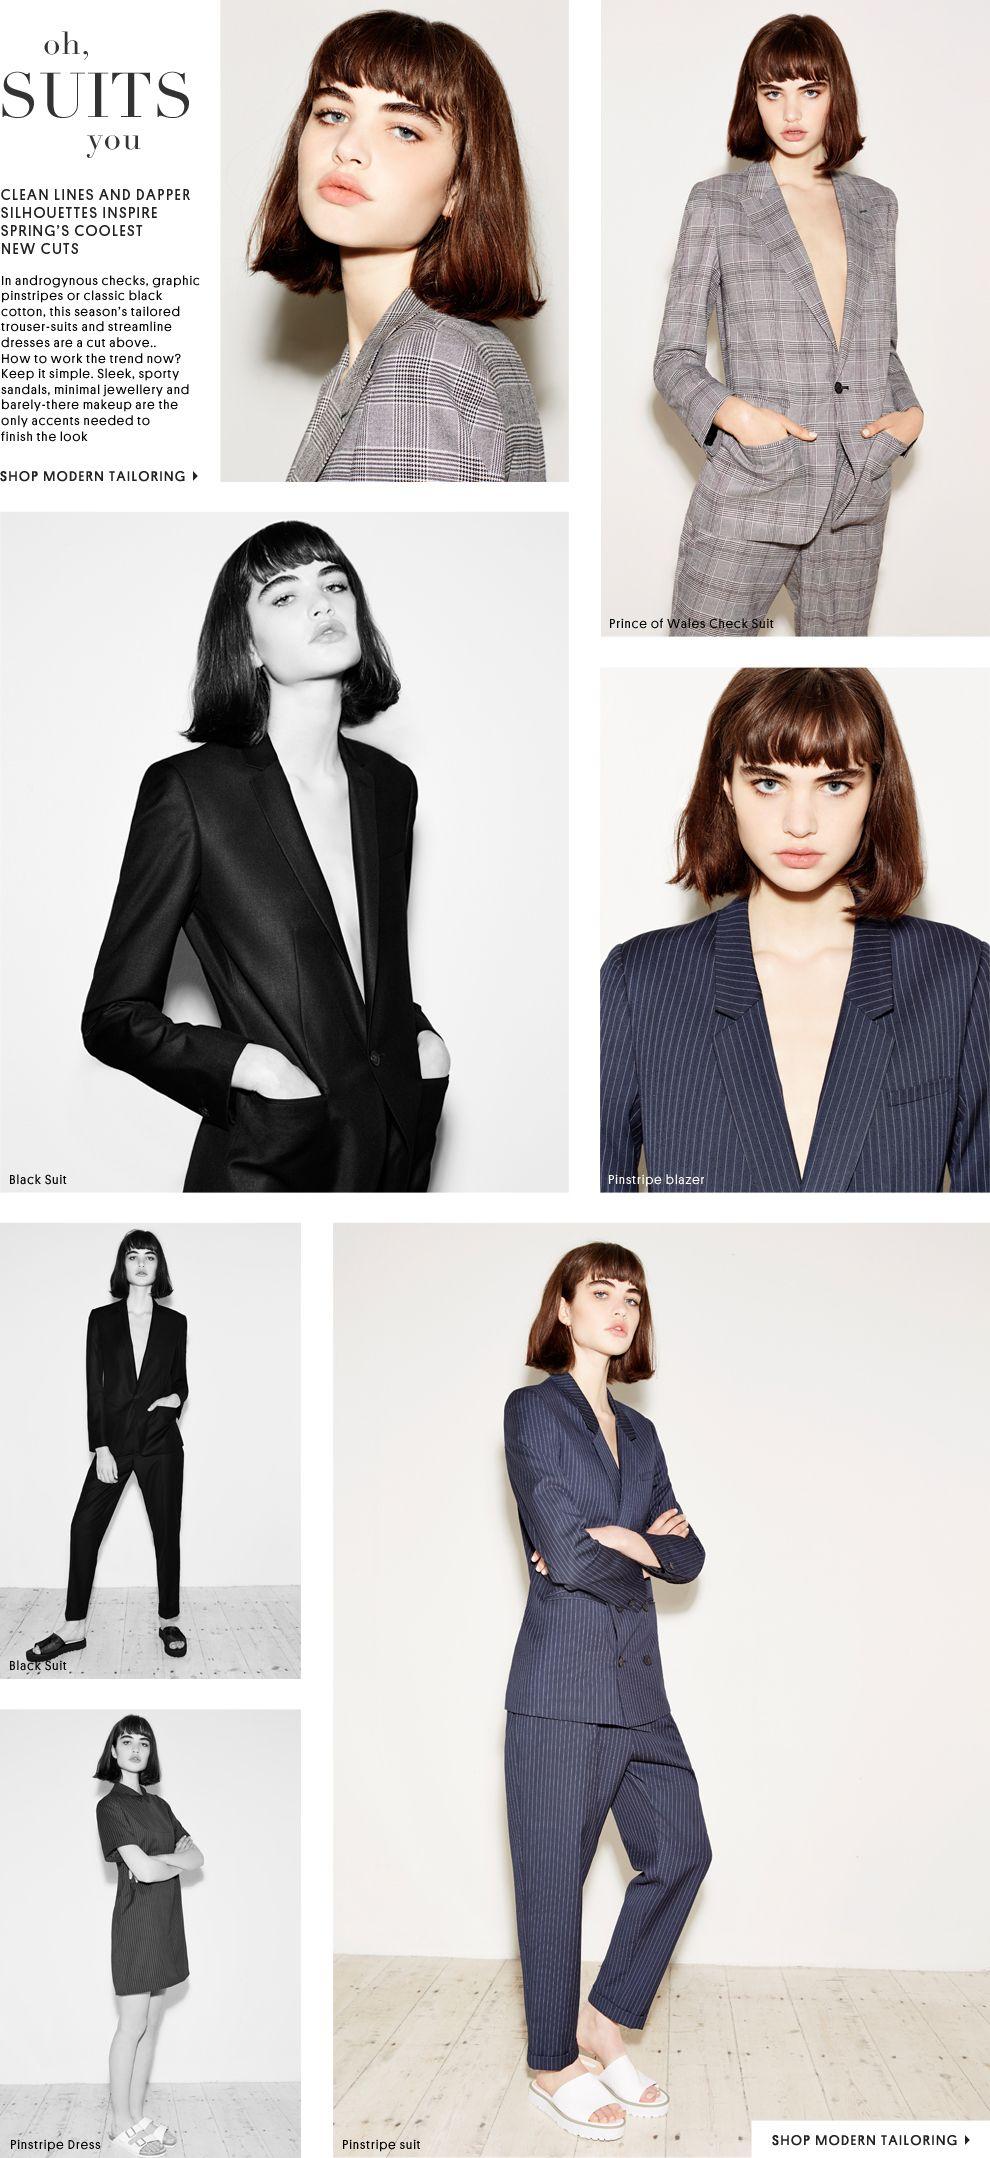 Topshop Modern Tailoring #unstructured #workwear #topshop ...